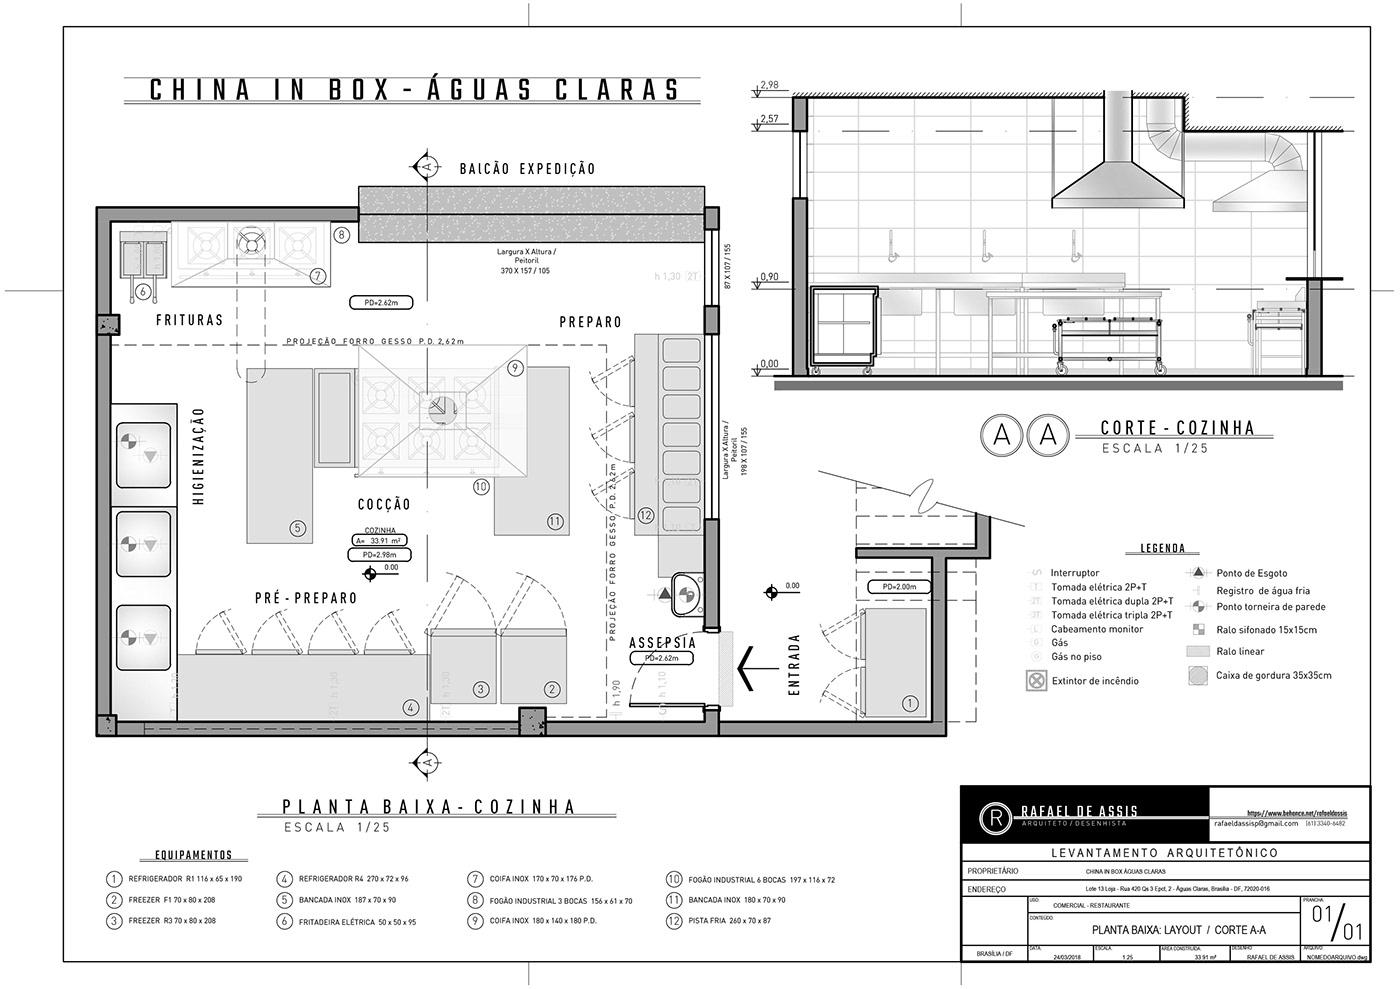 desenho técnico em CAD (drafting) on Behance